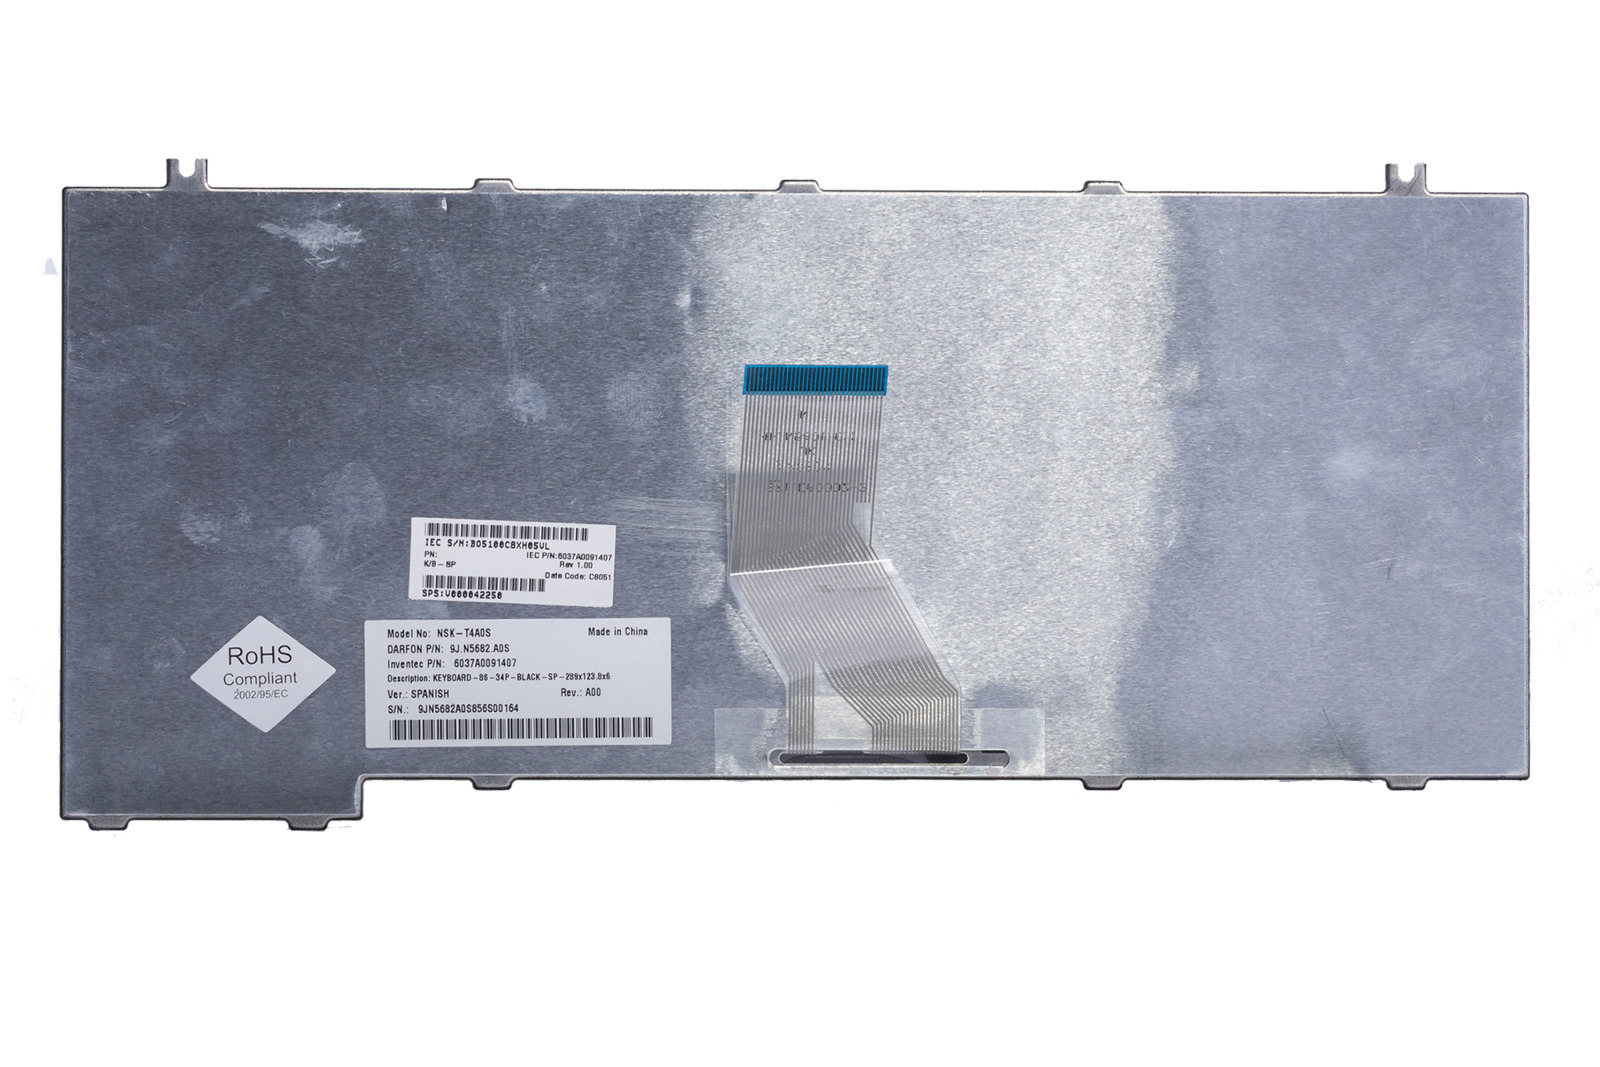 Keyboard Toshiba 9J.N5682.A0S (Spanish)